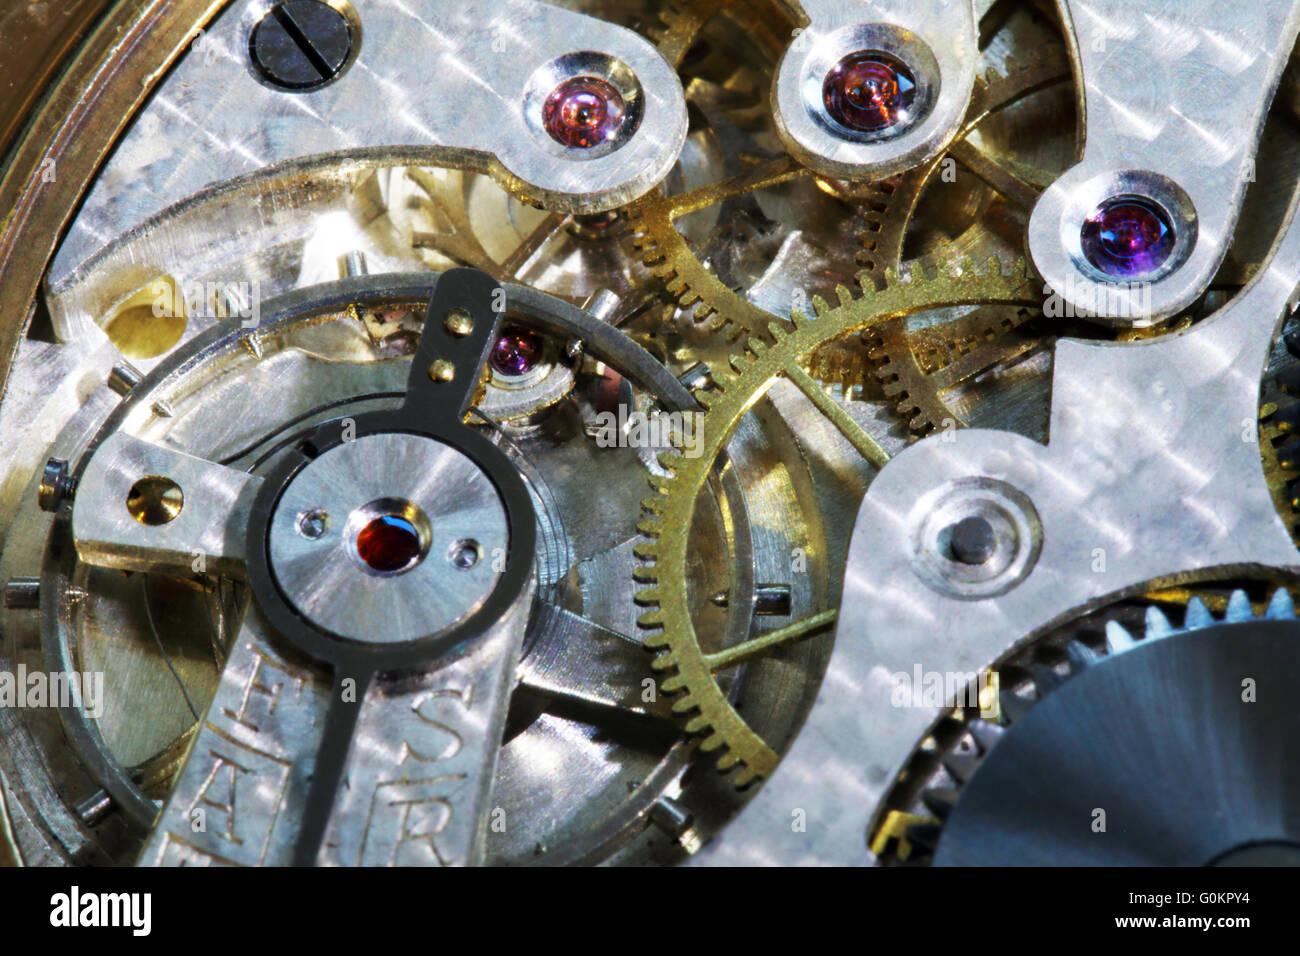 Inner workings of a vintage pocket watch - Stock Image